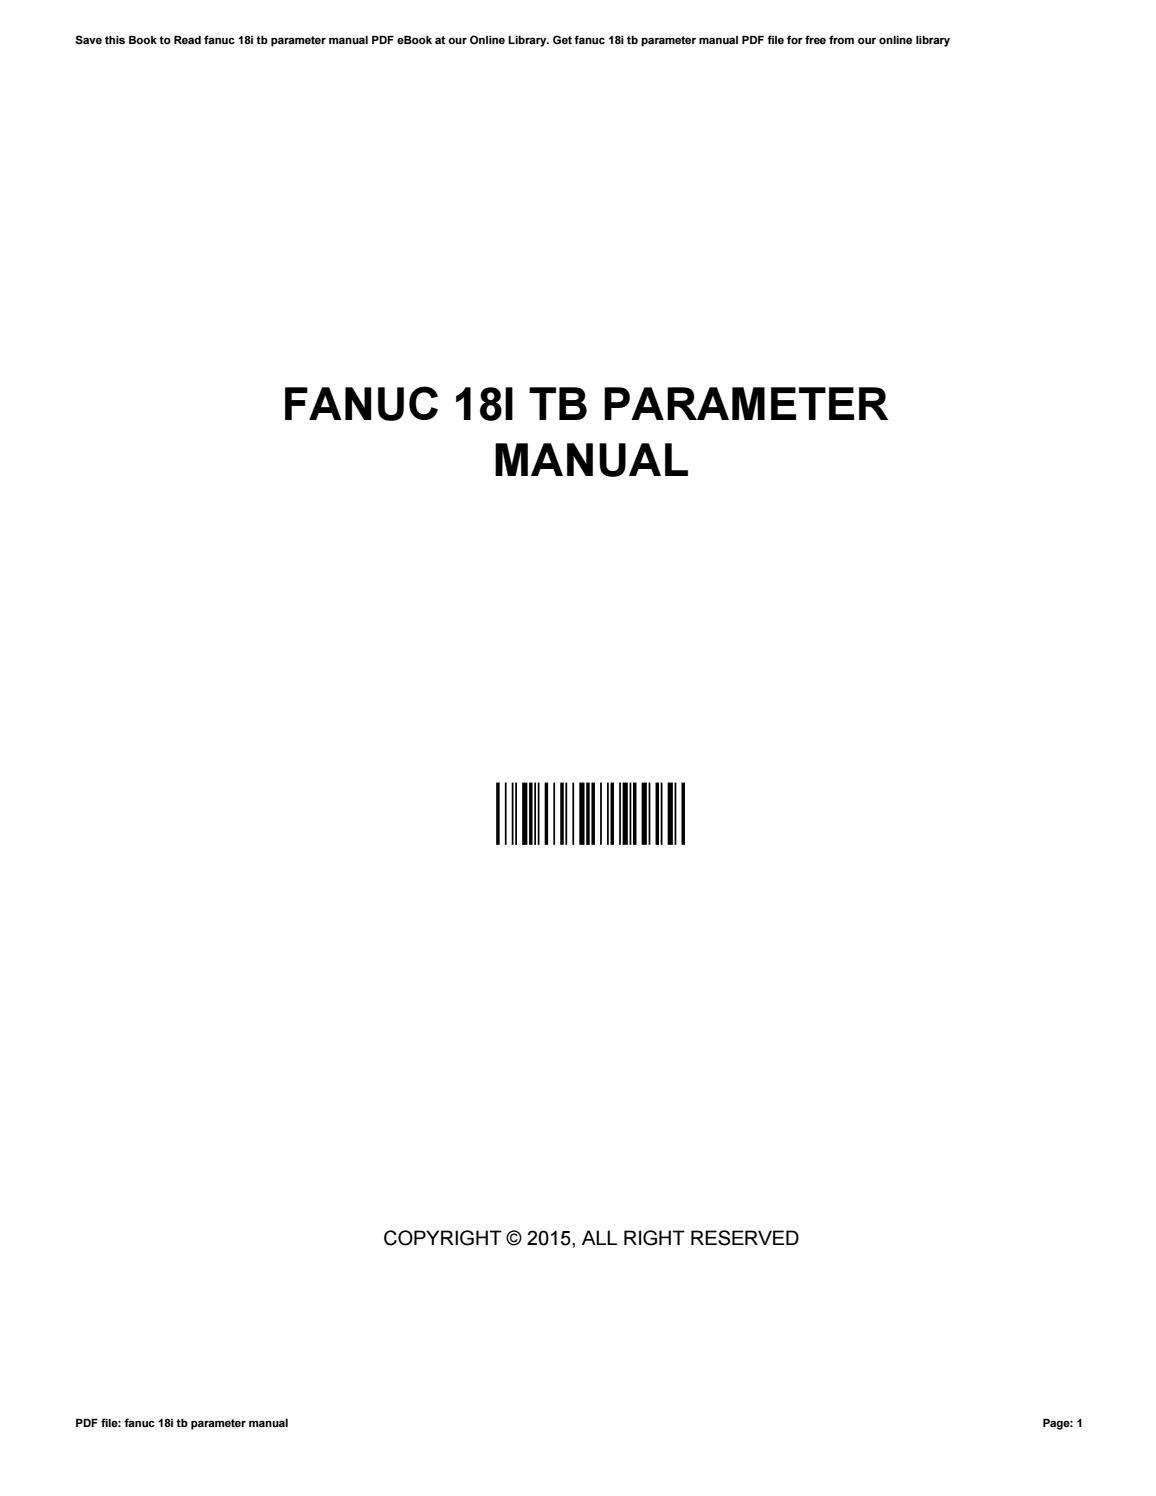 Fanuc 18i tb manual pdf